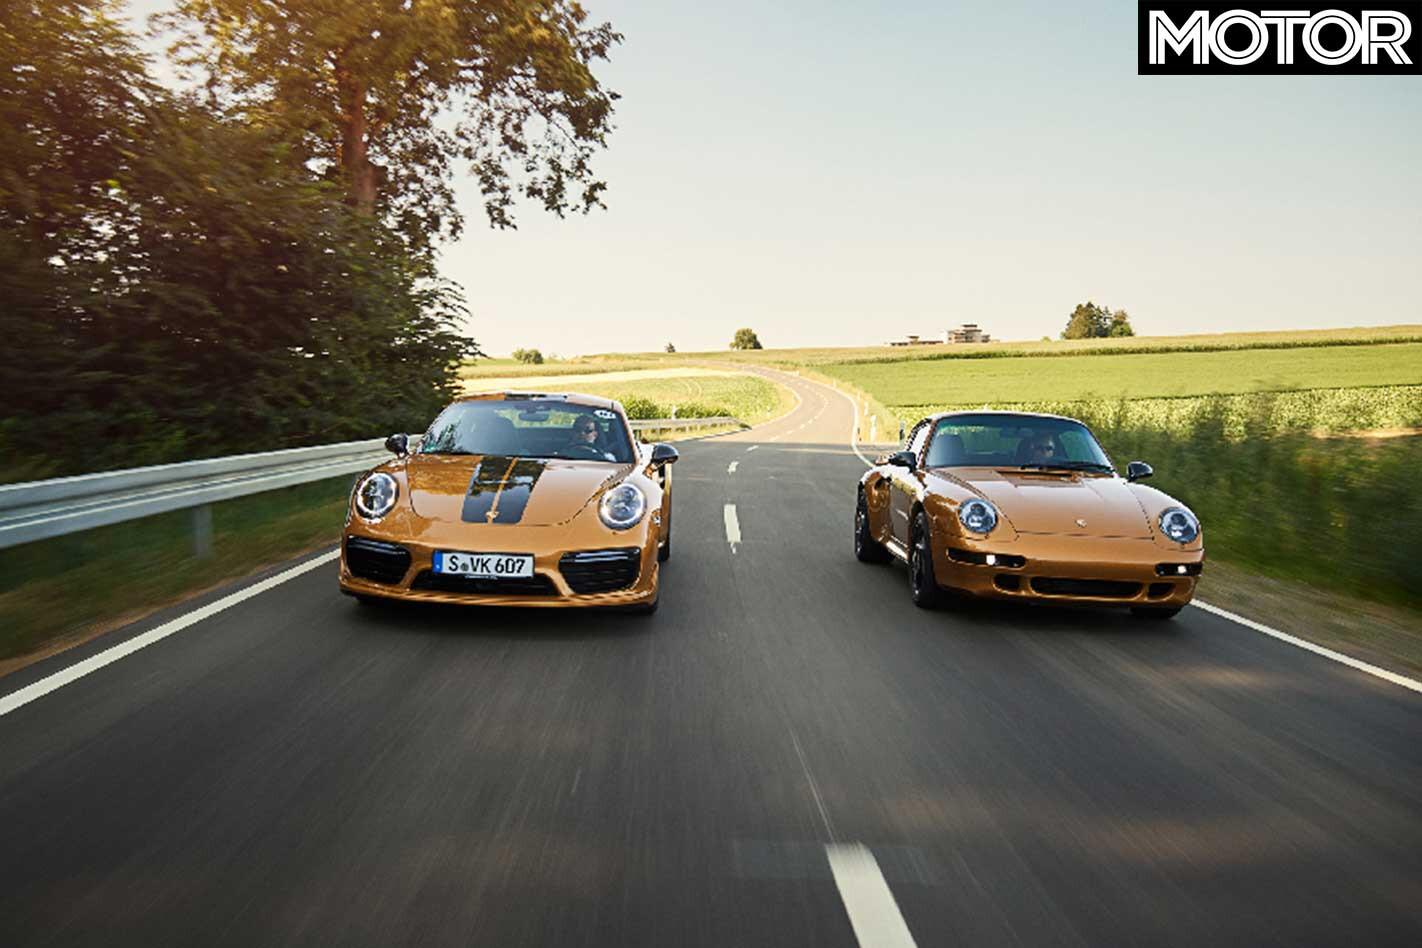 Rebuilt Porsche 993 911 Turbo Unveiled Turbo S Exclusive Jpg